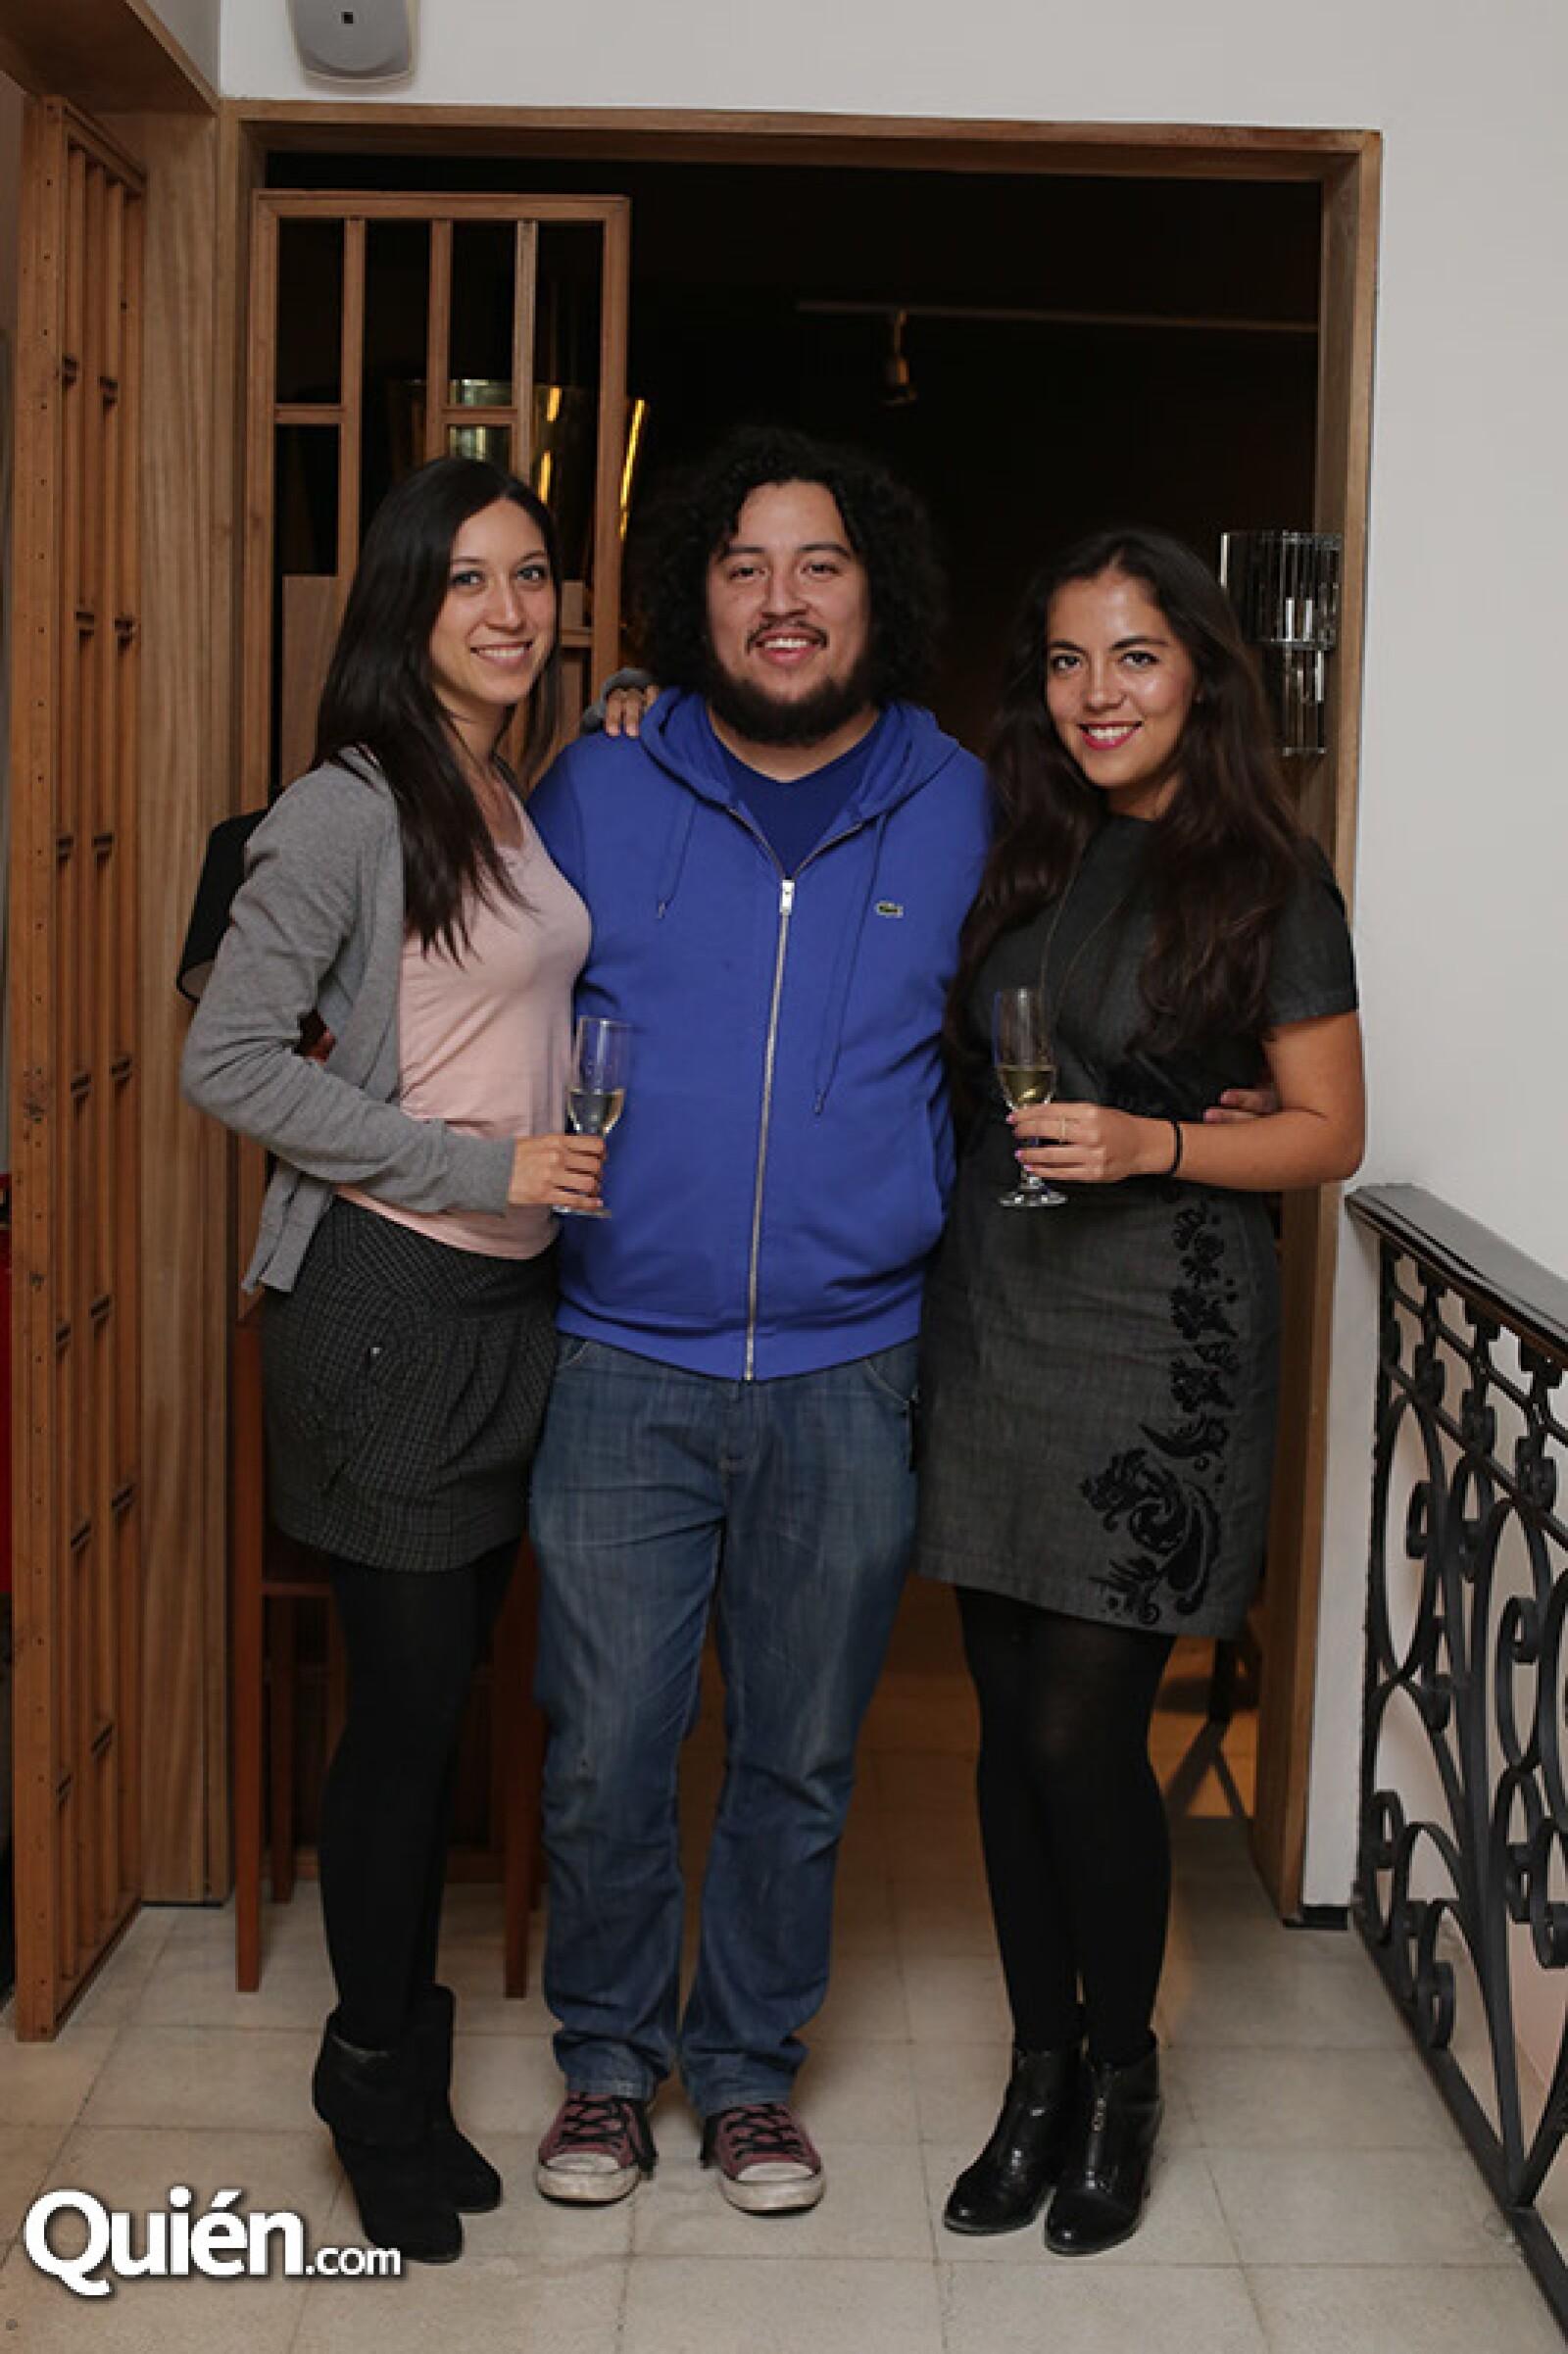 Alejandra Cervántes,Víctor Alemán y Marianne Carrasco